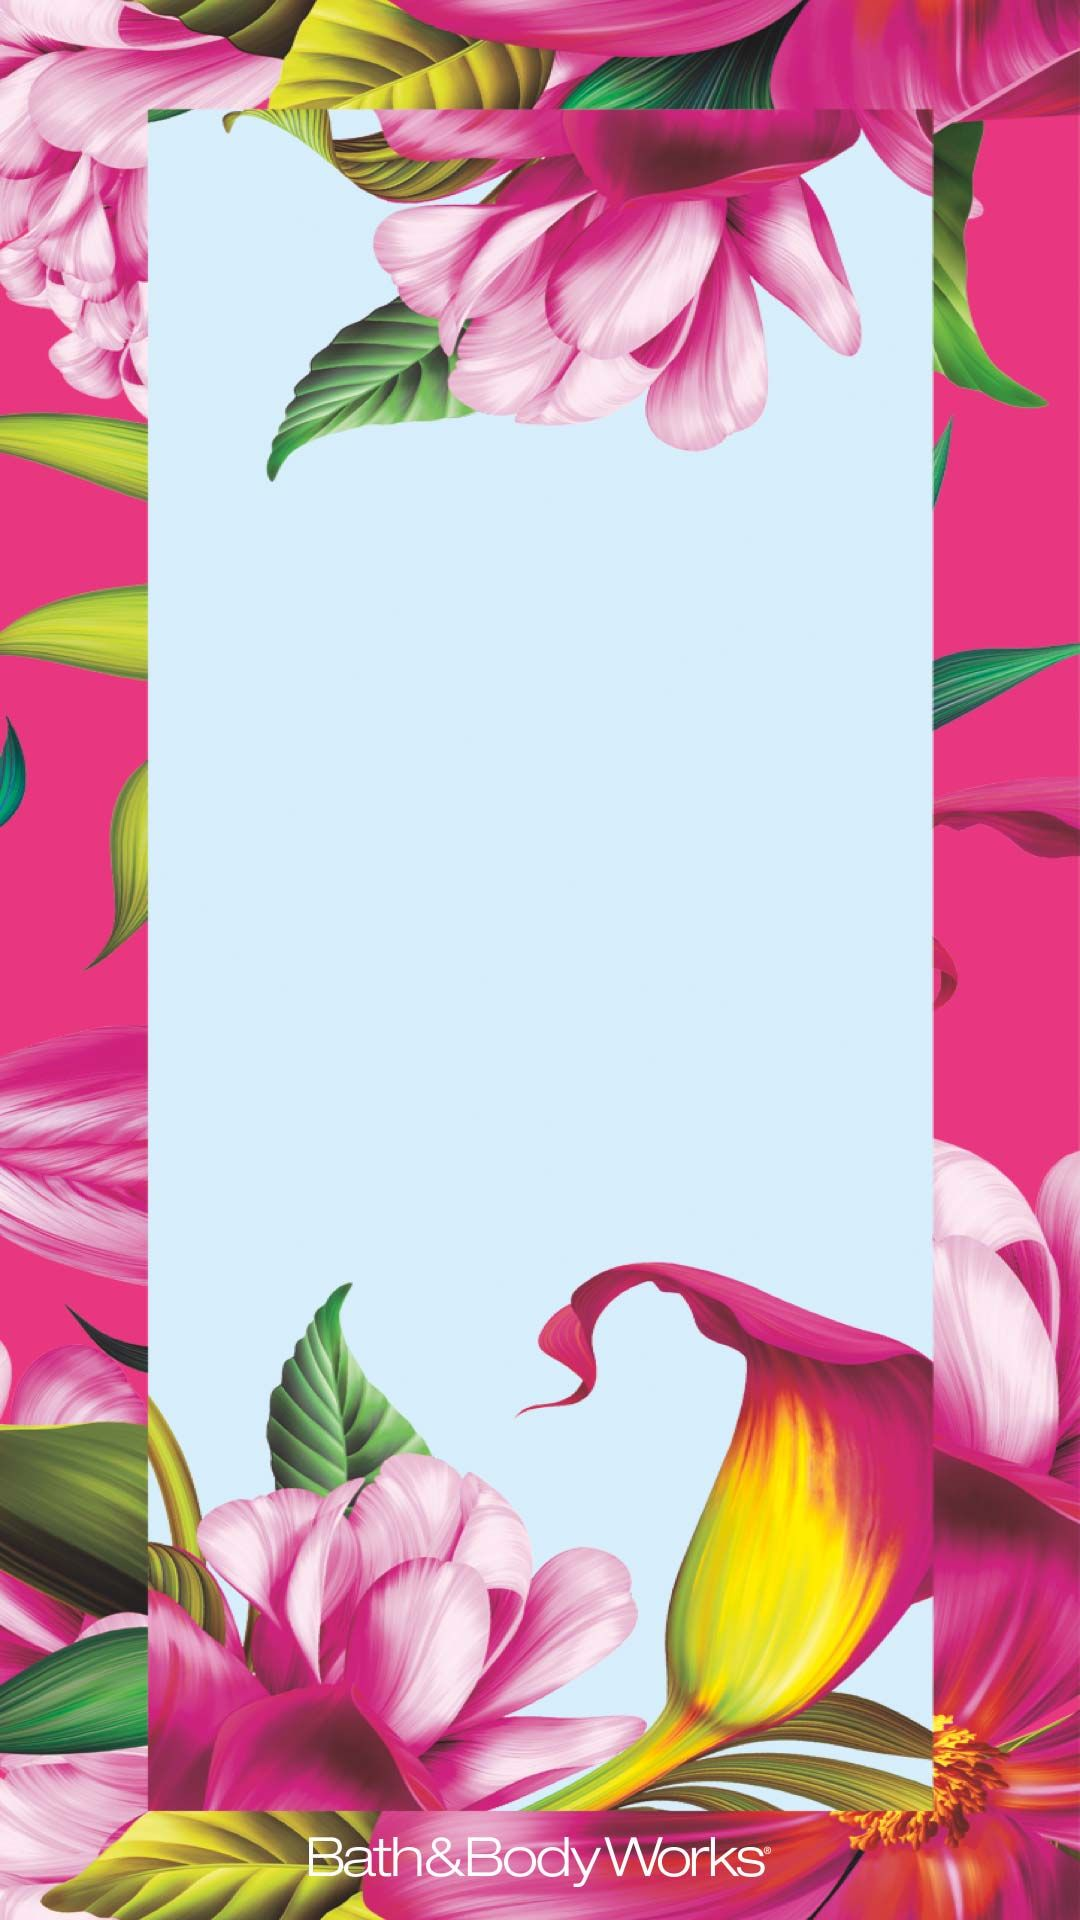 Pink Tropical Flowers iPhone Wallpaper Wallpaper iphone